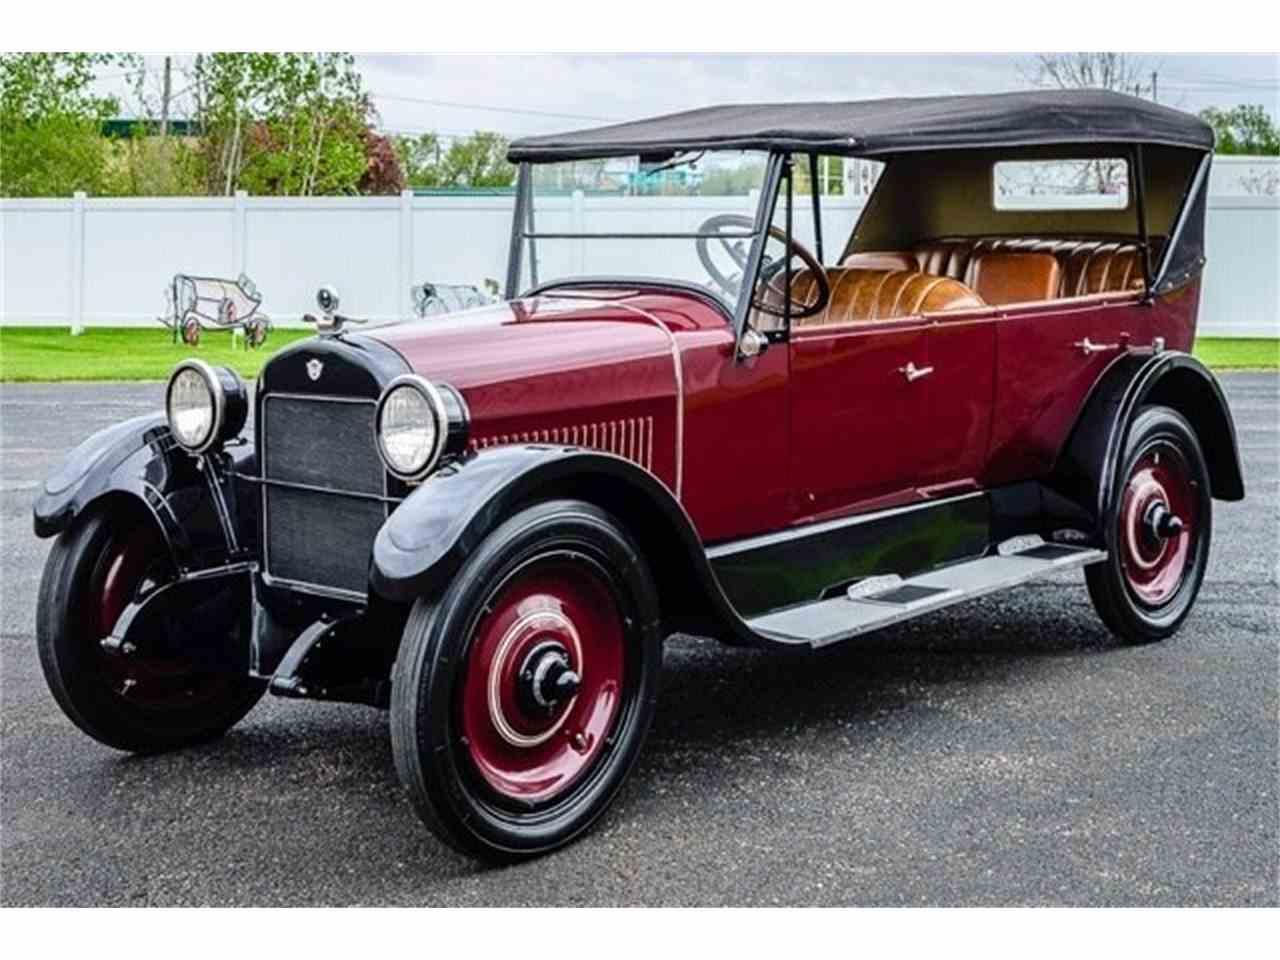 Reo Car: 1924 REO Touring Phaeton For Sale